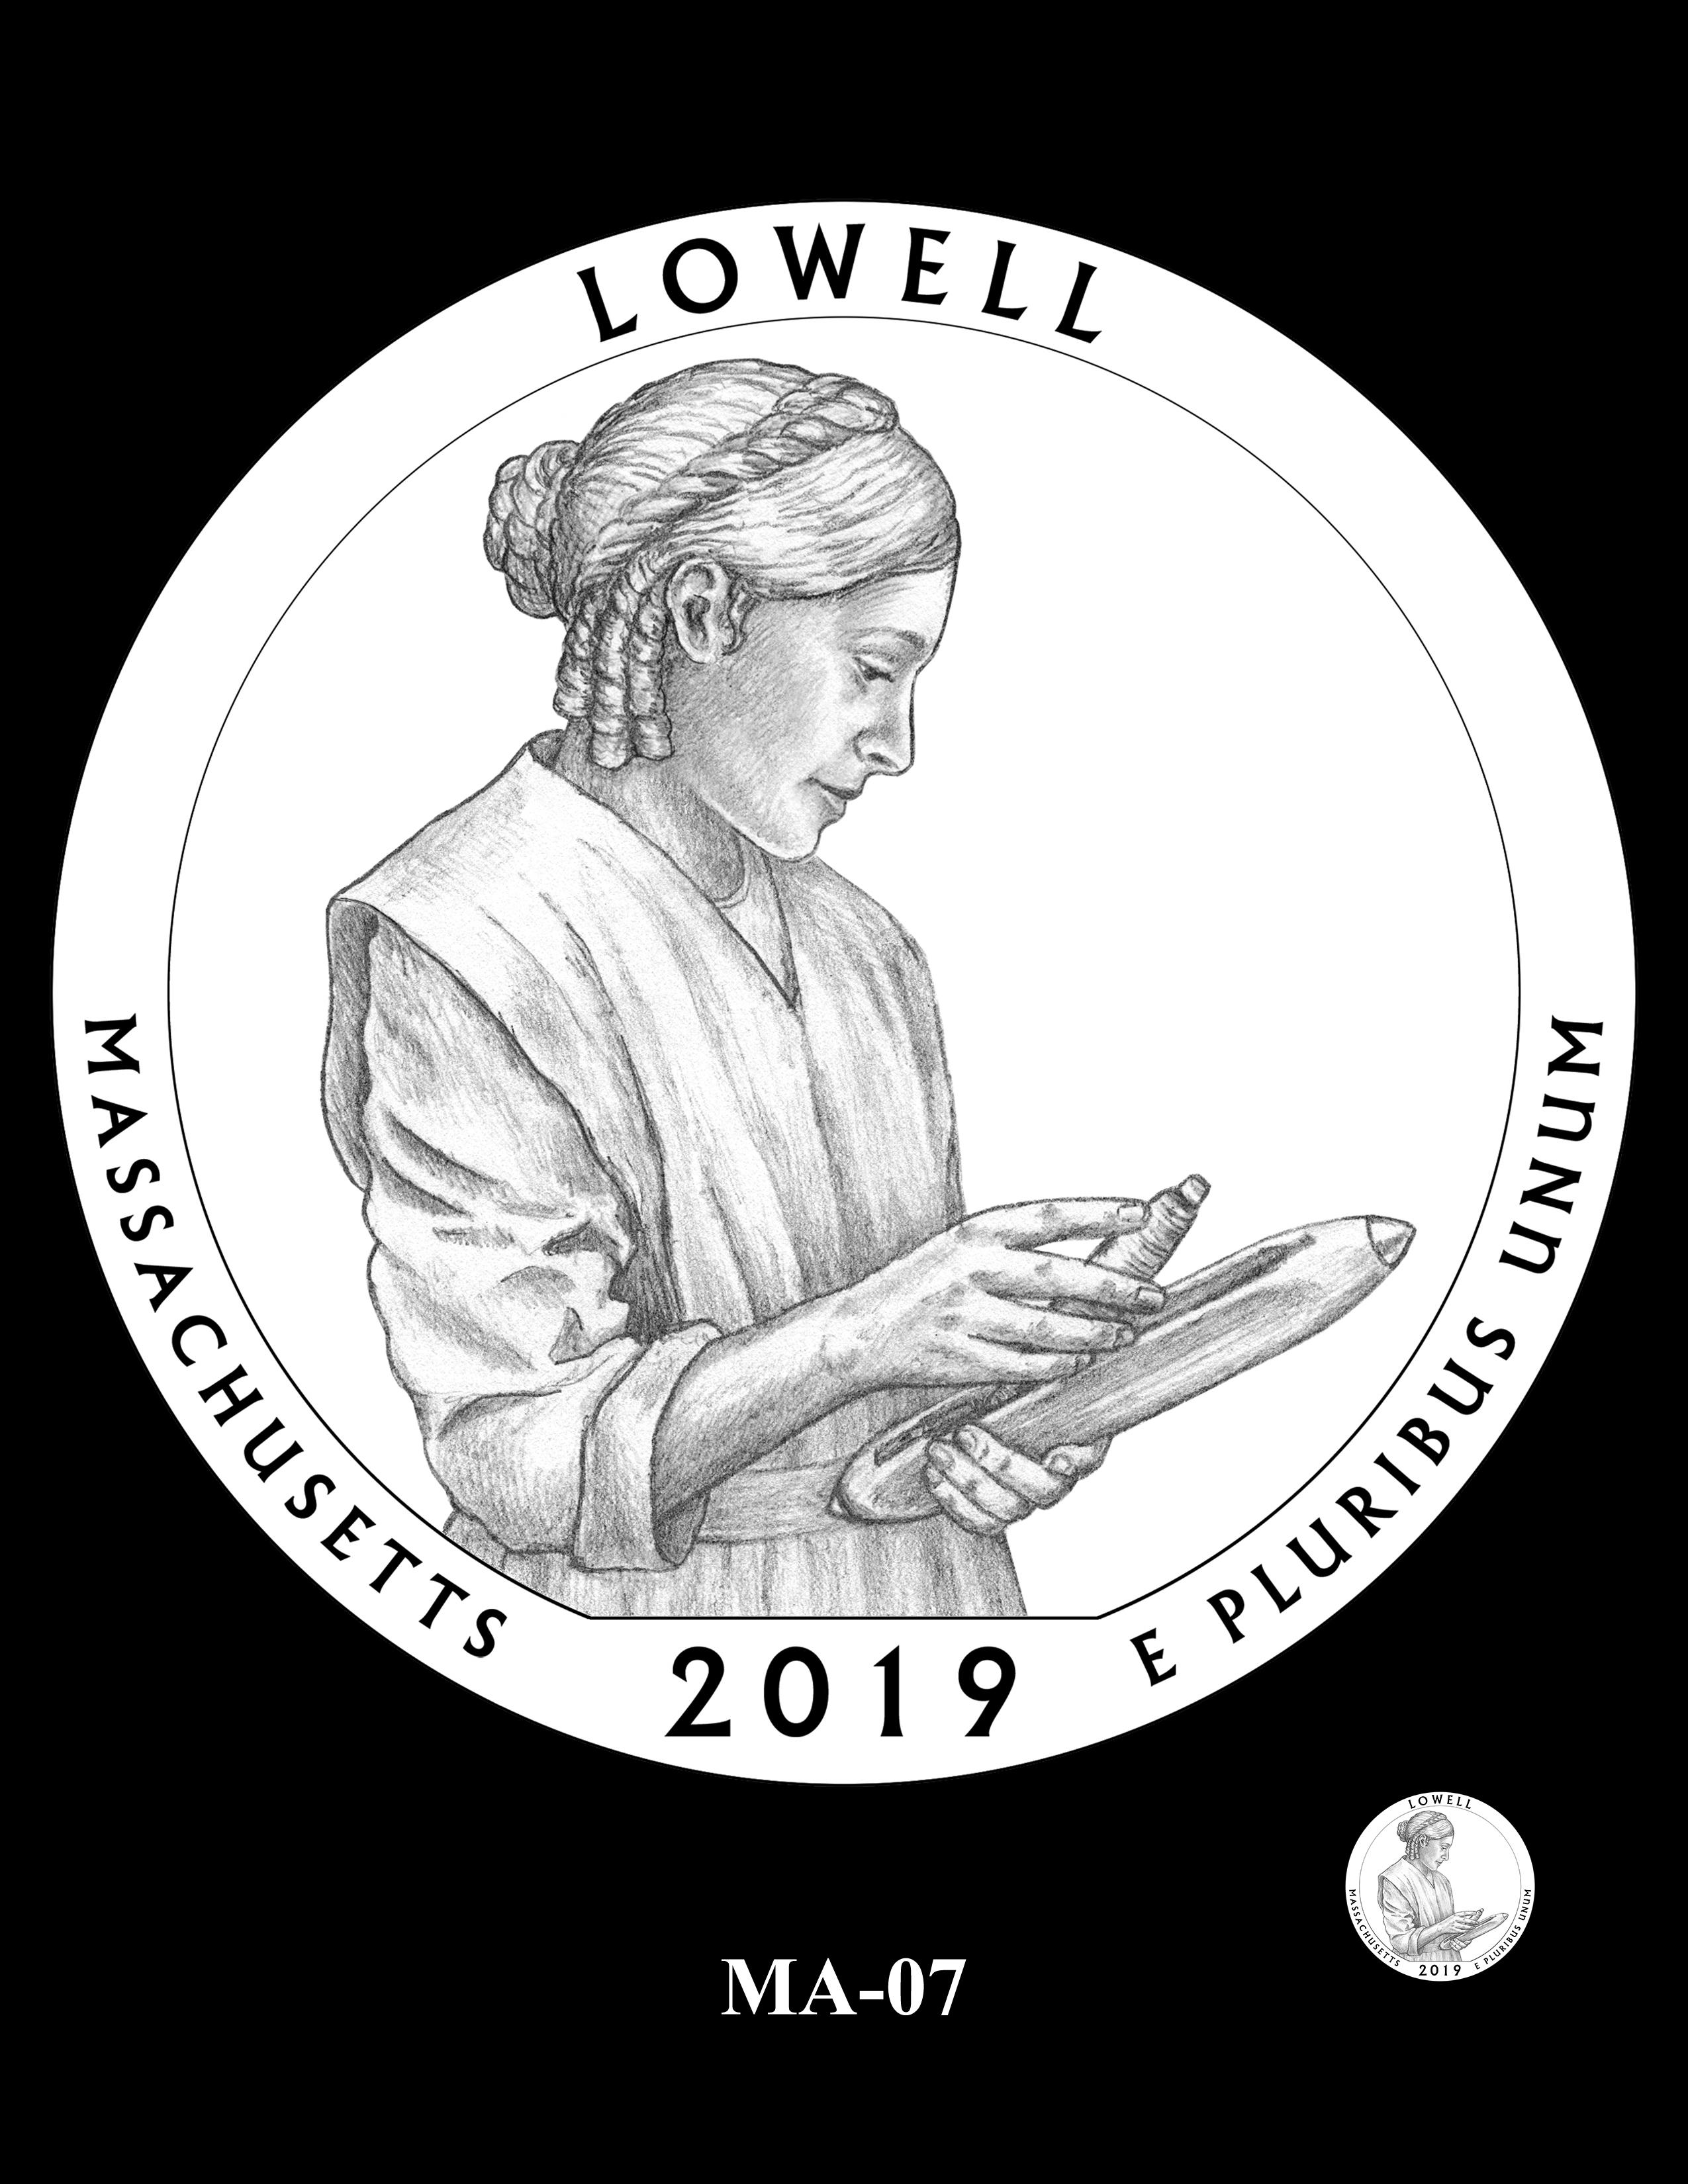 MA-07 -- 2019 America the Beautiful Quarters® Program